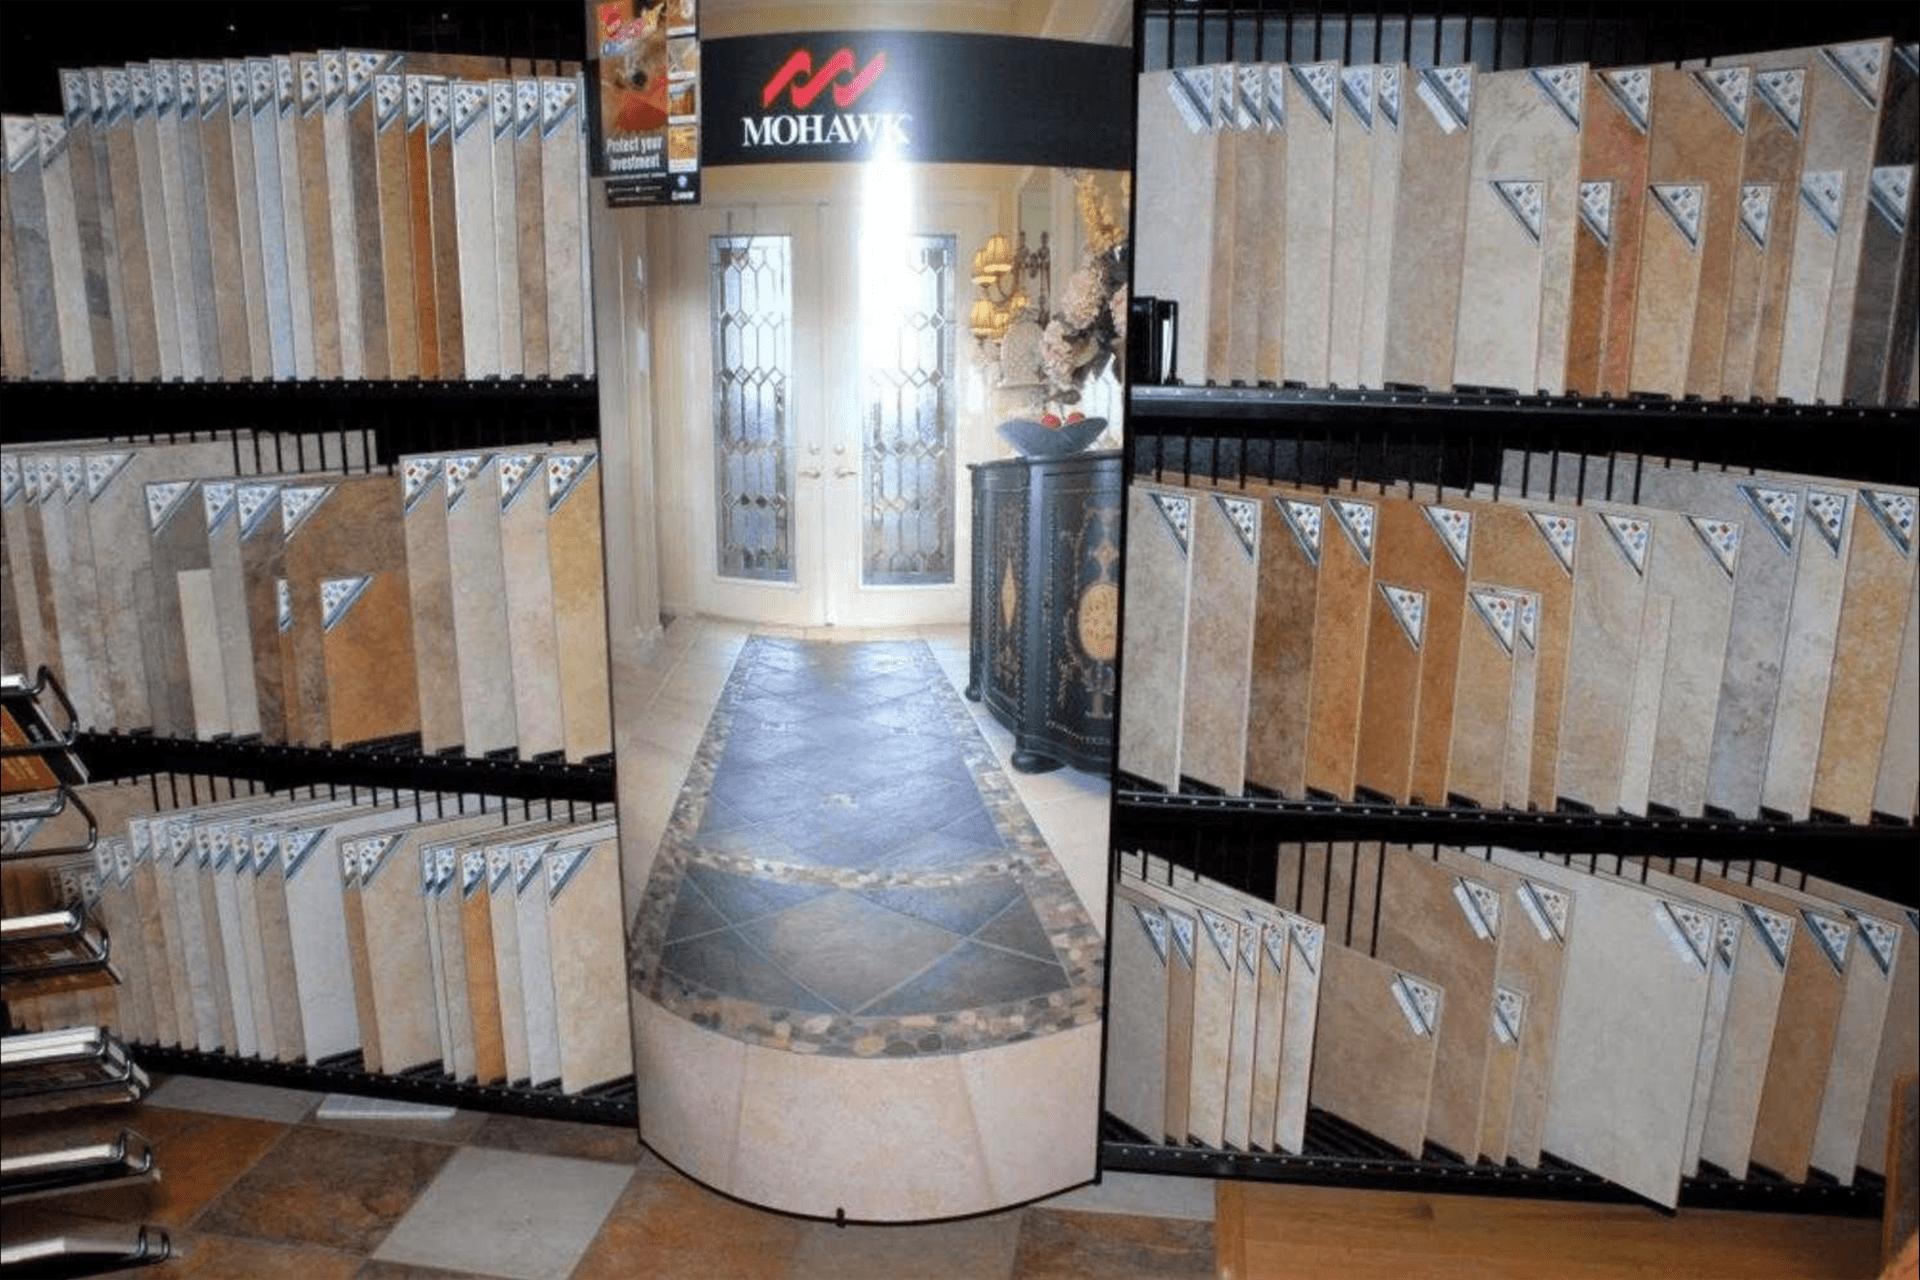 Mohawk tile options in Fort Myers, FL from Britt's Carpet Outlet